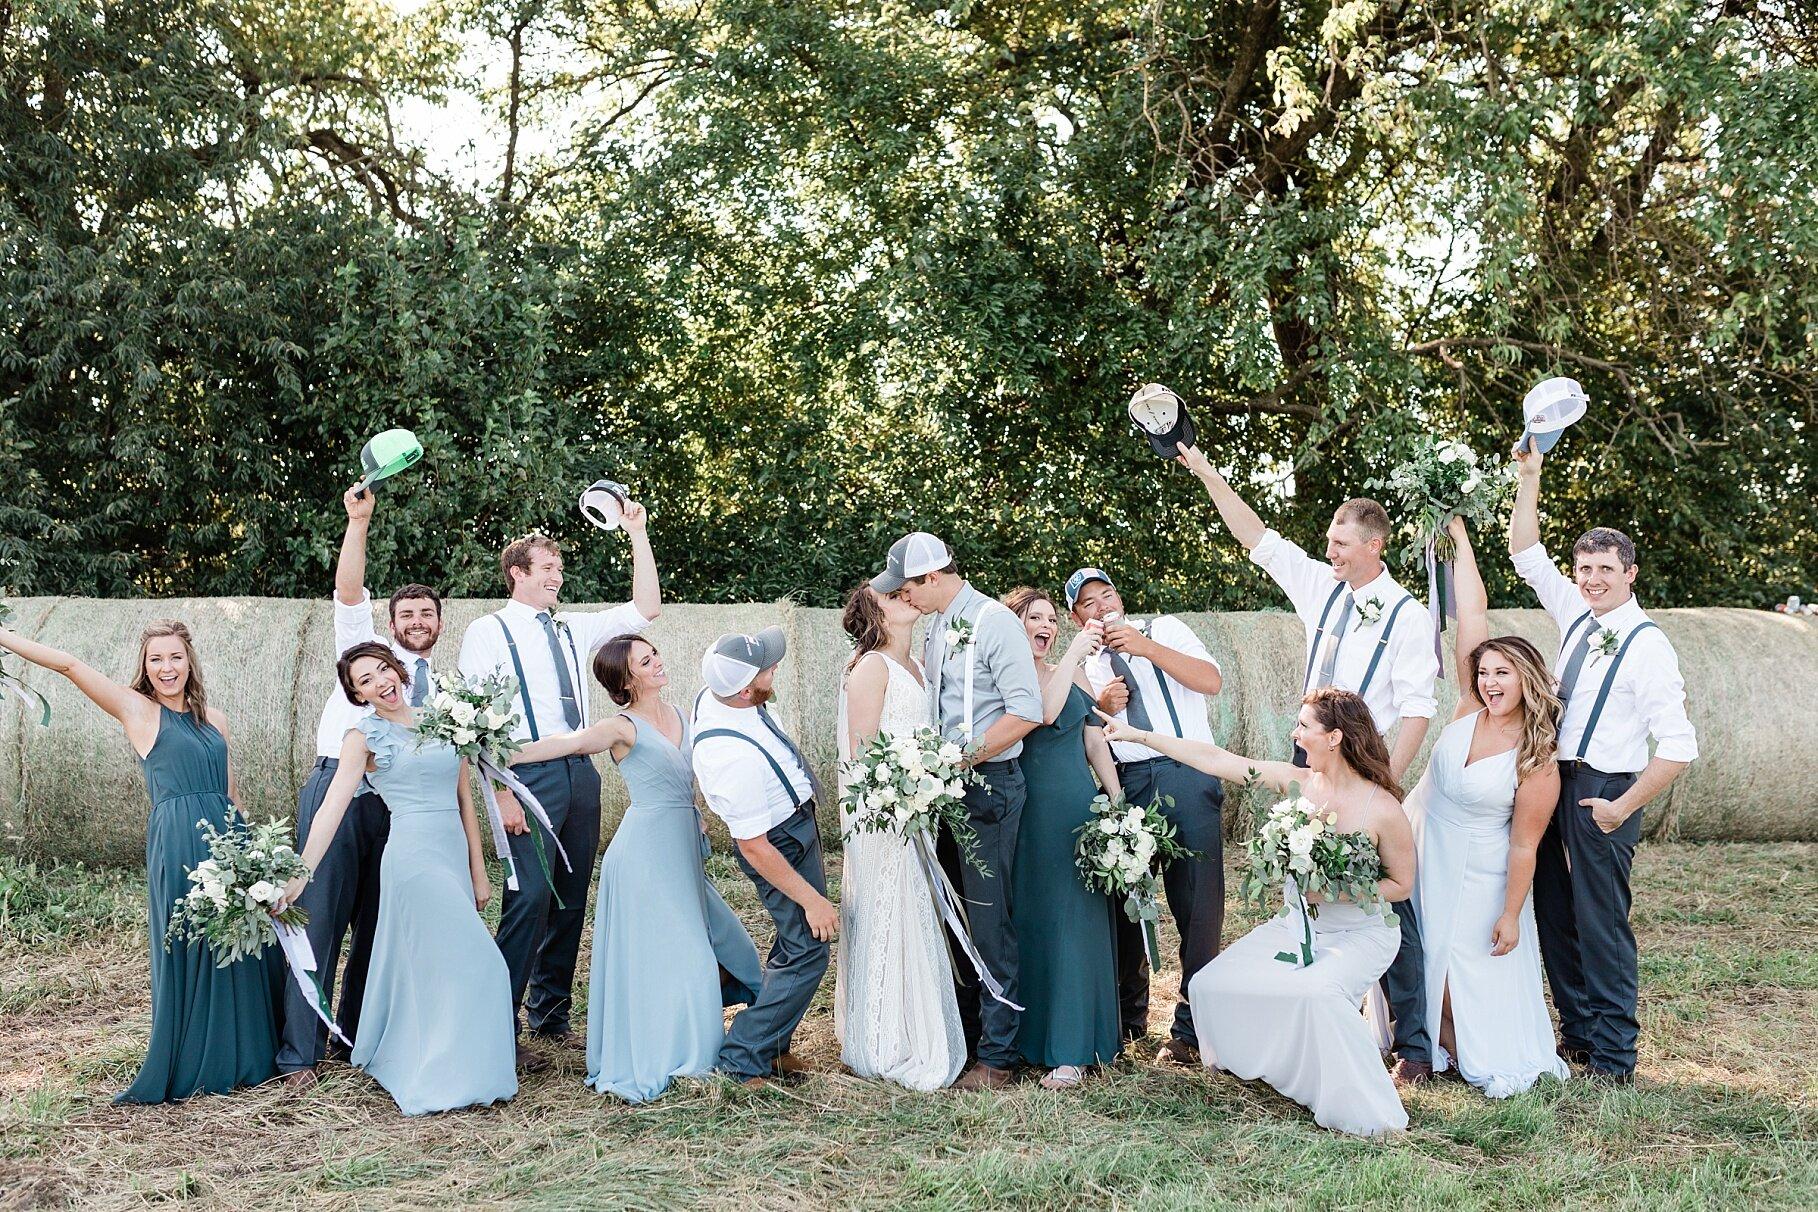 Earth-Toned Wedding by KKP Associate Wedding Photographer and Kelsi Kliethermes Photography Best Columbia Missouri Wedding Photographer_0006.jpg